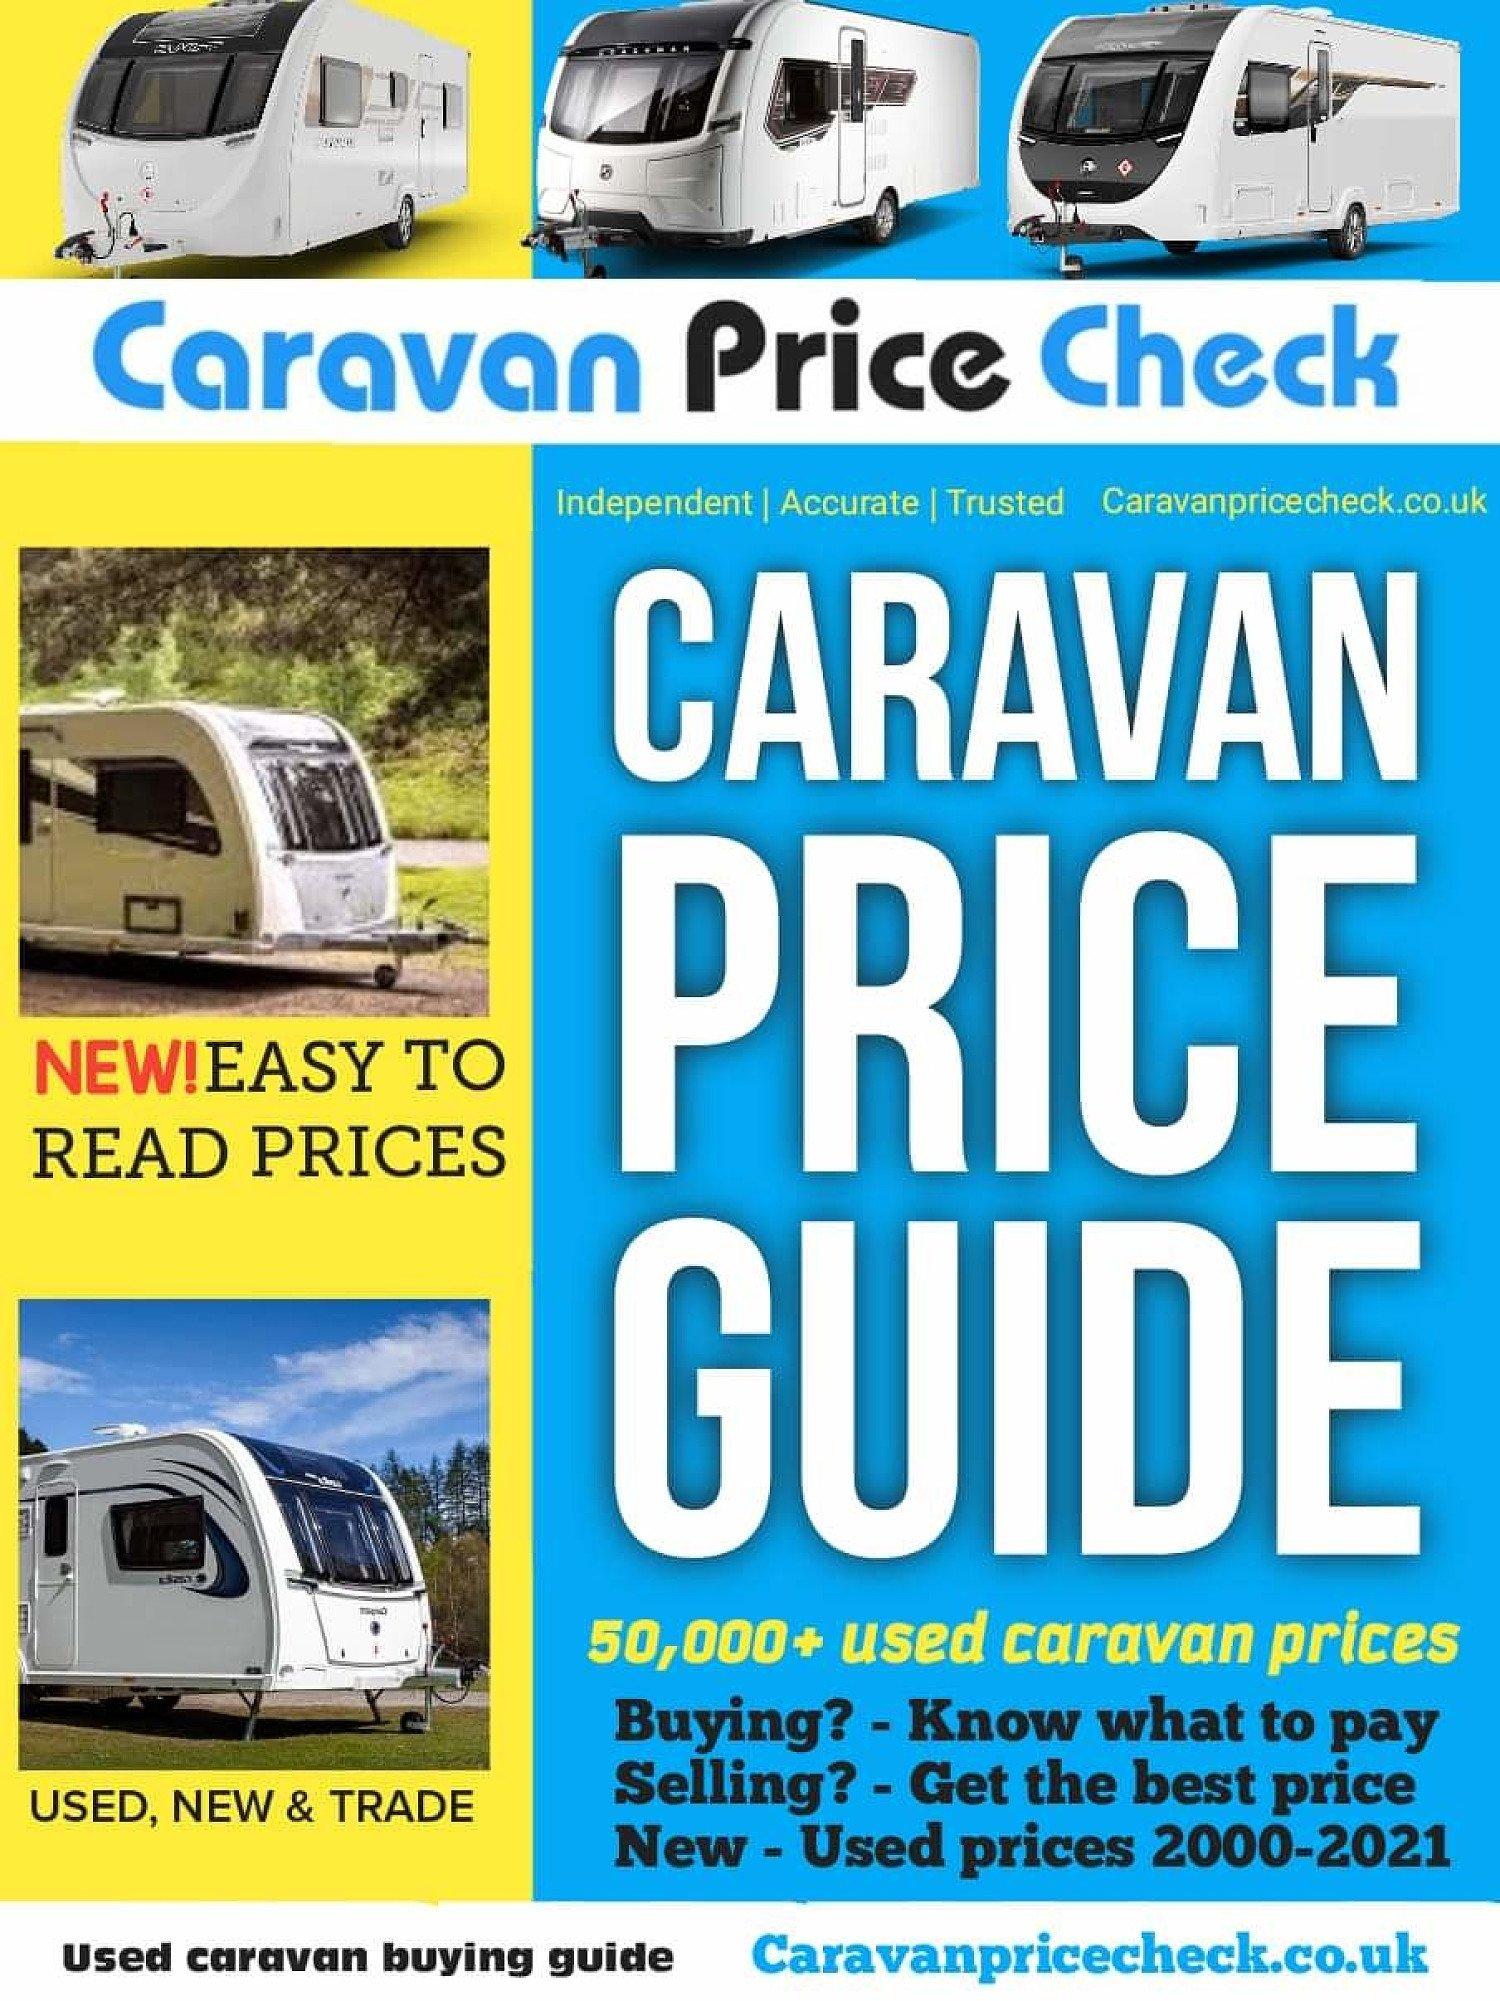 The Brand new Caravan Price Guide